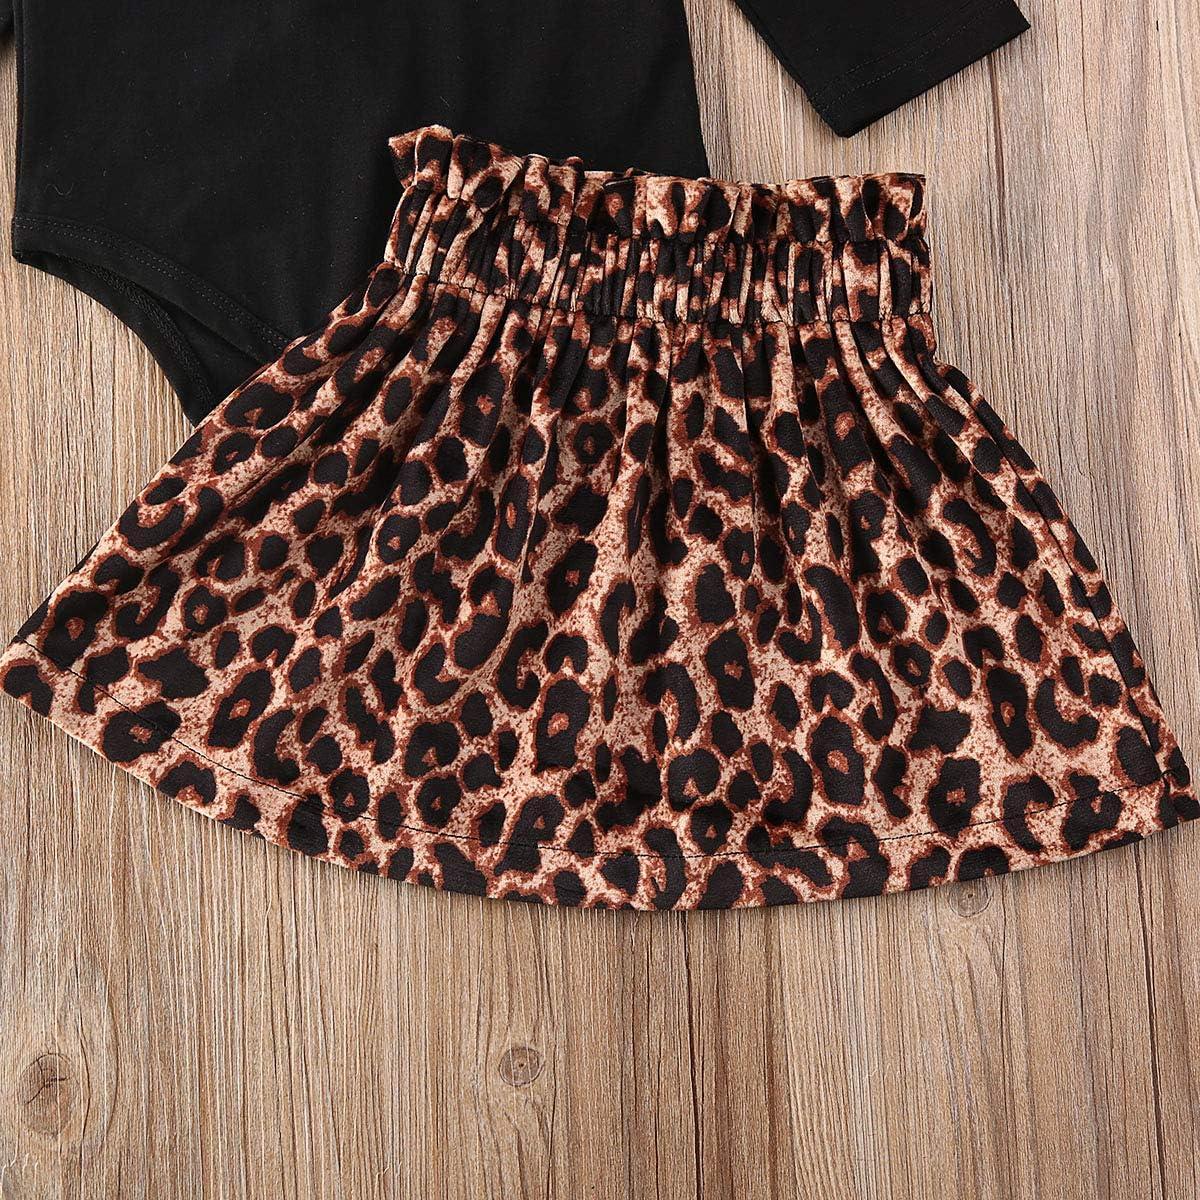 Infant Baby M/ädchen Kleidung R/üschen Langarm Strampler Bodysuit Tops Leopard Tutu Rock Outfits Set 0-24 Monate